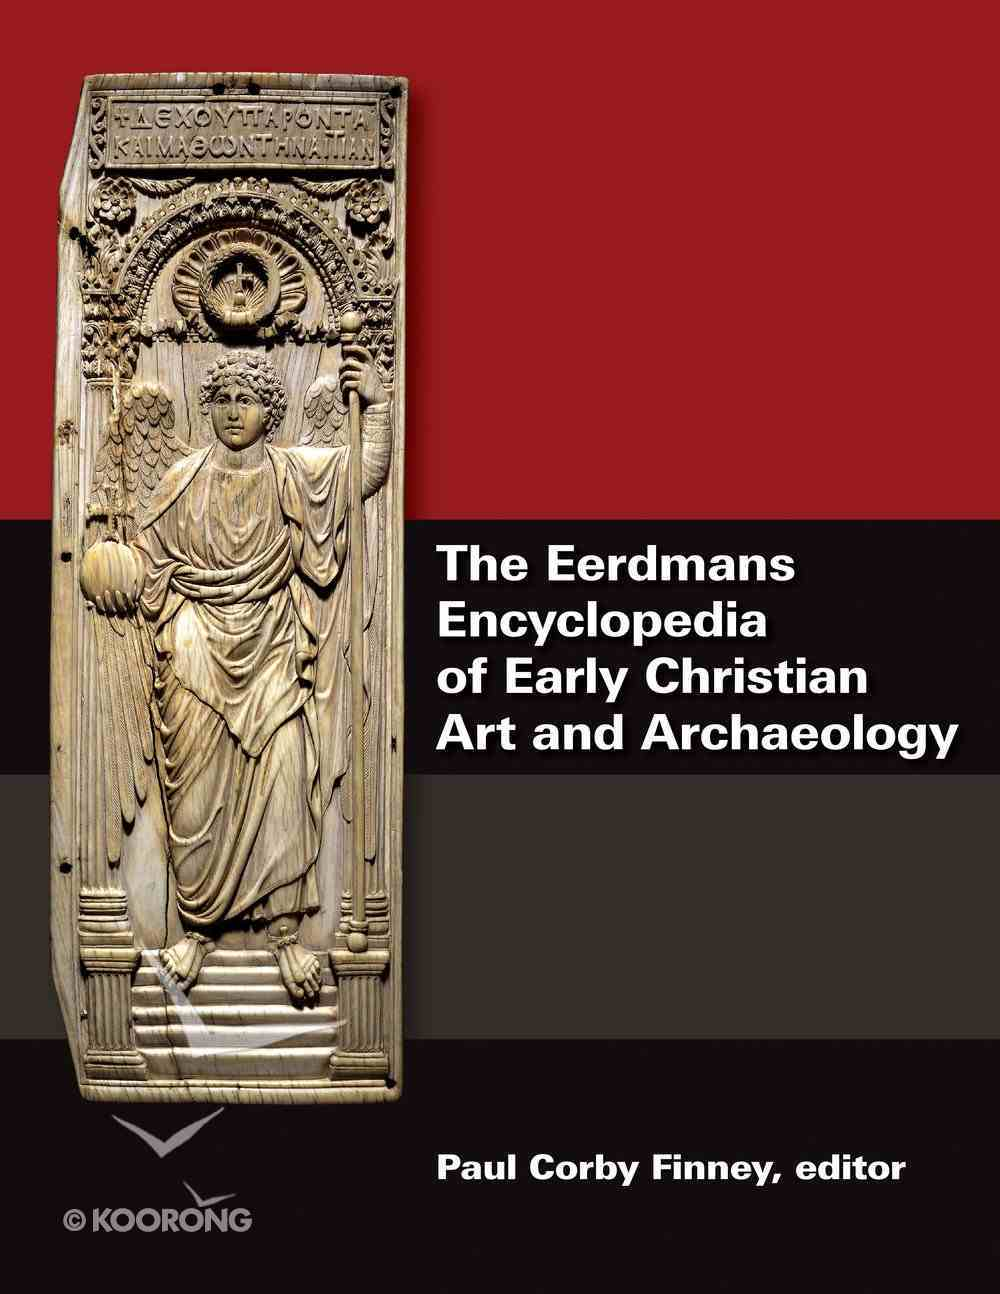 The Eerdmans Encyclopedia of Early Christian Art and Archaeology (3 Vol Set) Hardback